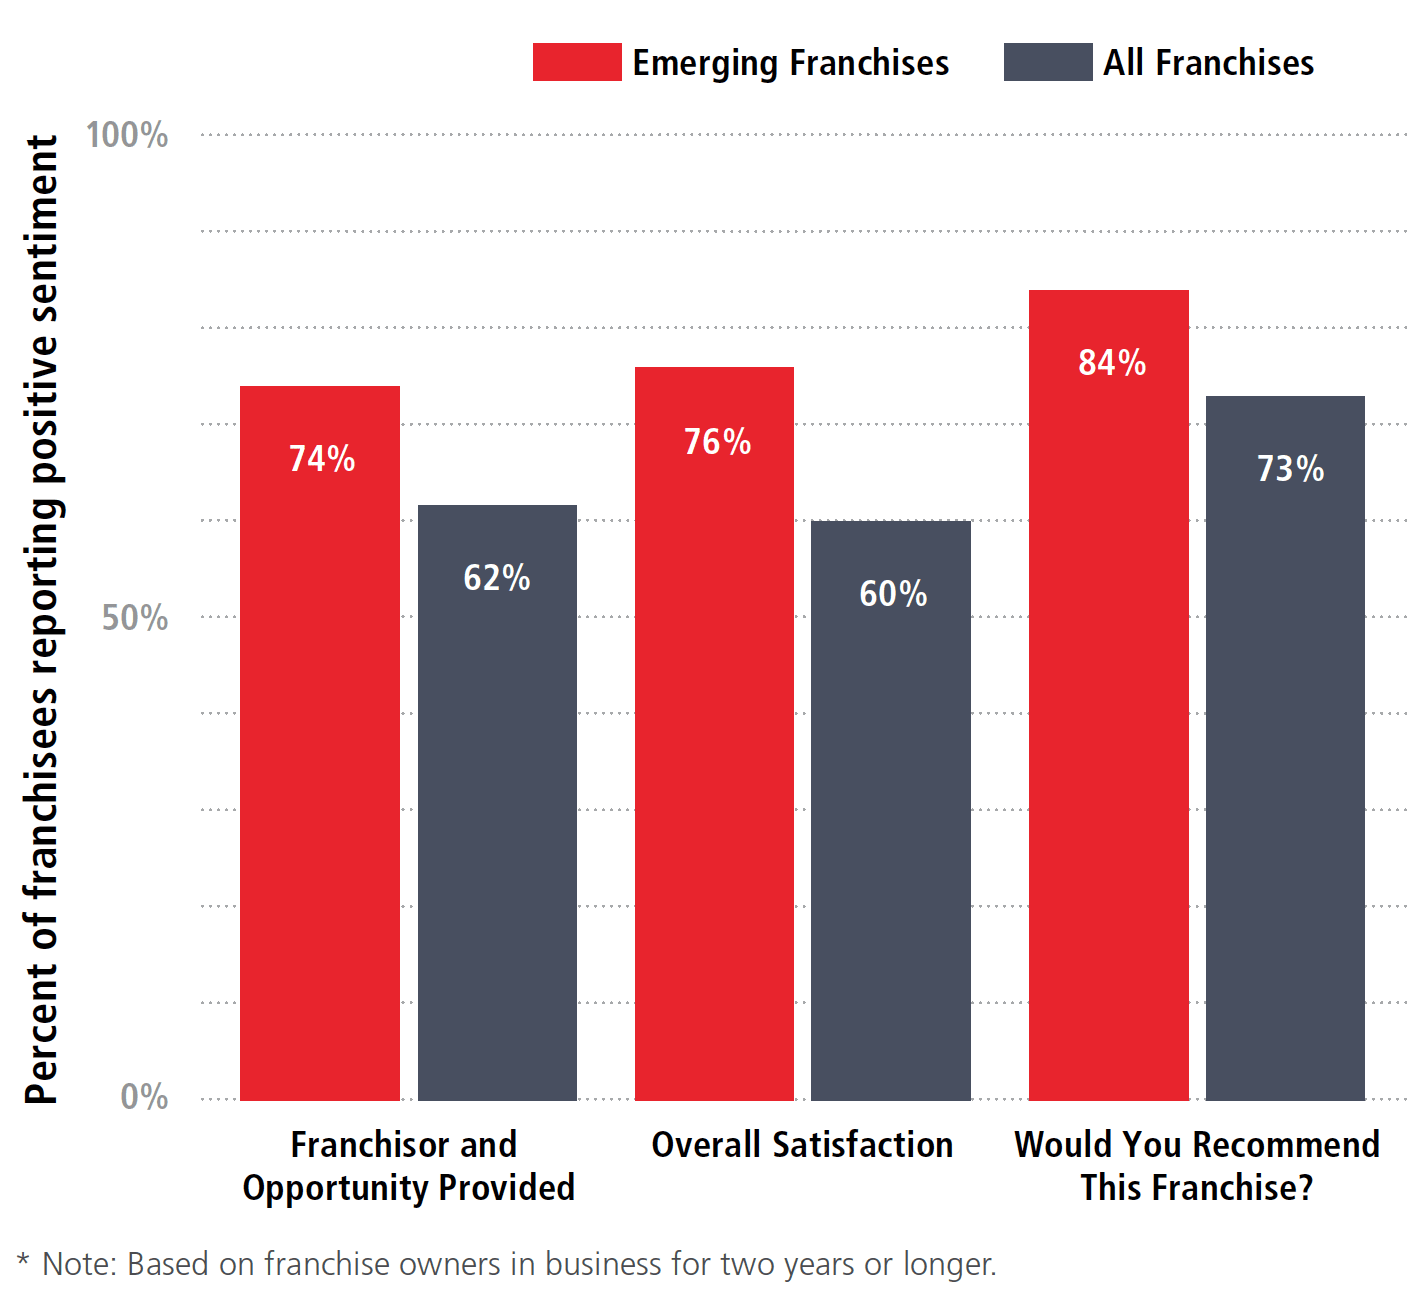 Emerging Brands: Franchisee Satisfaction